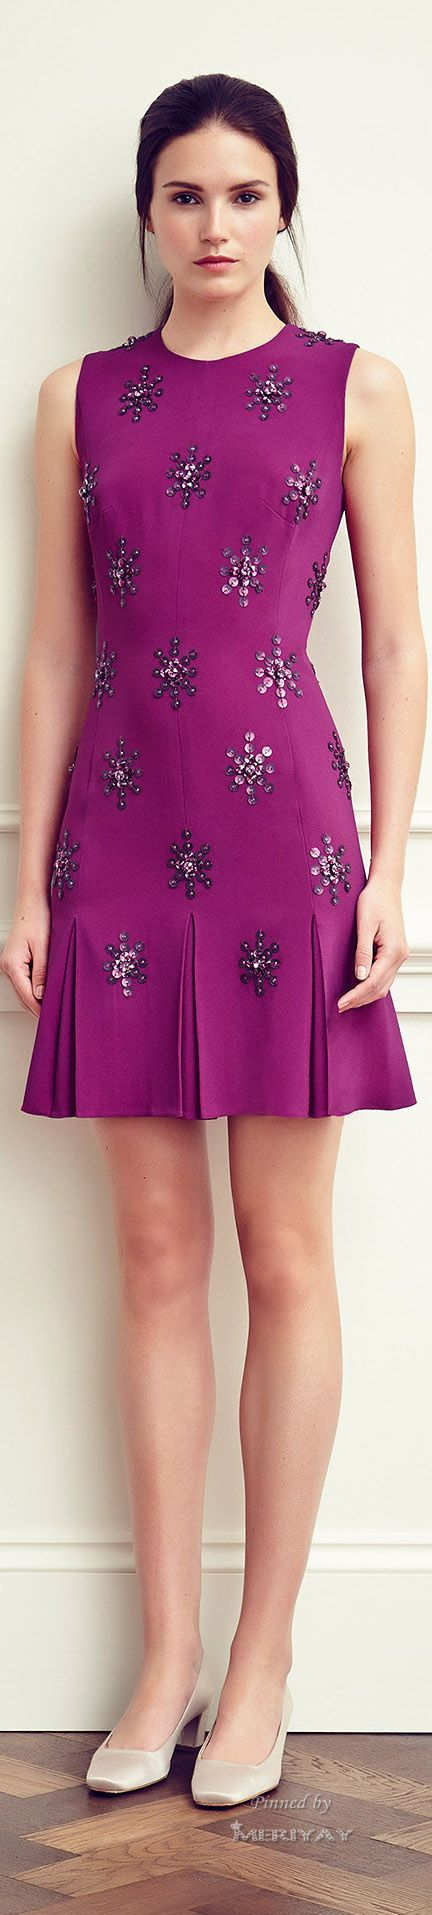 Jenny Packham Resort 2015. | Gisela | Pinterest | Vestidos de noche ...